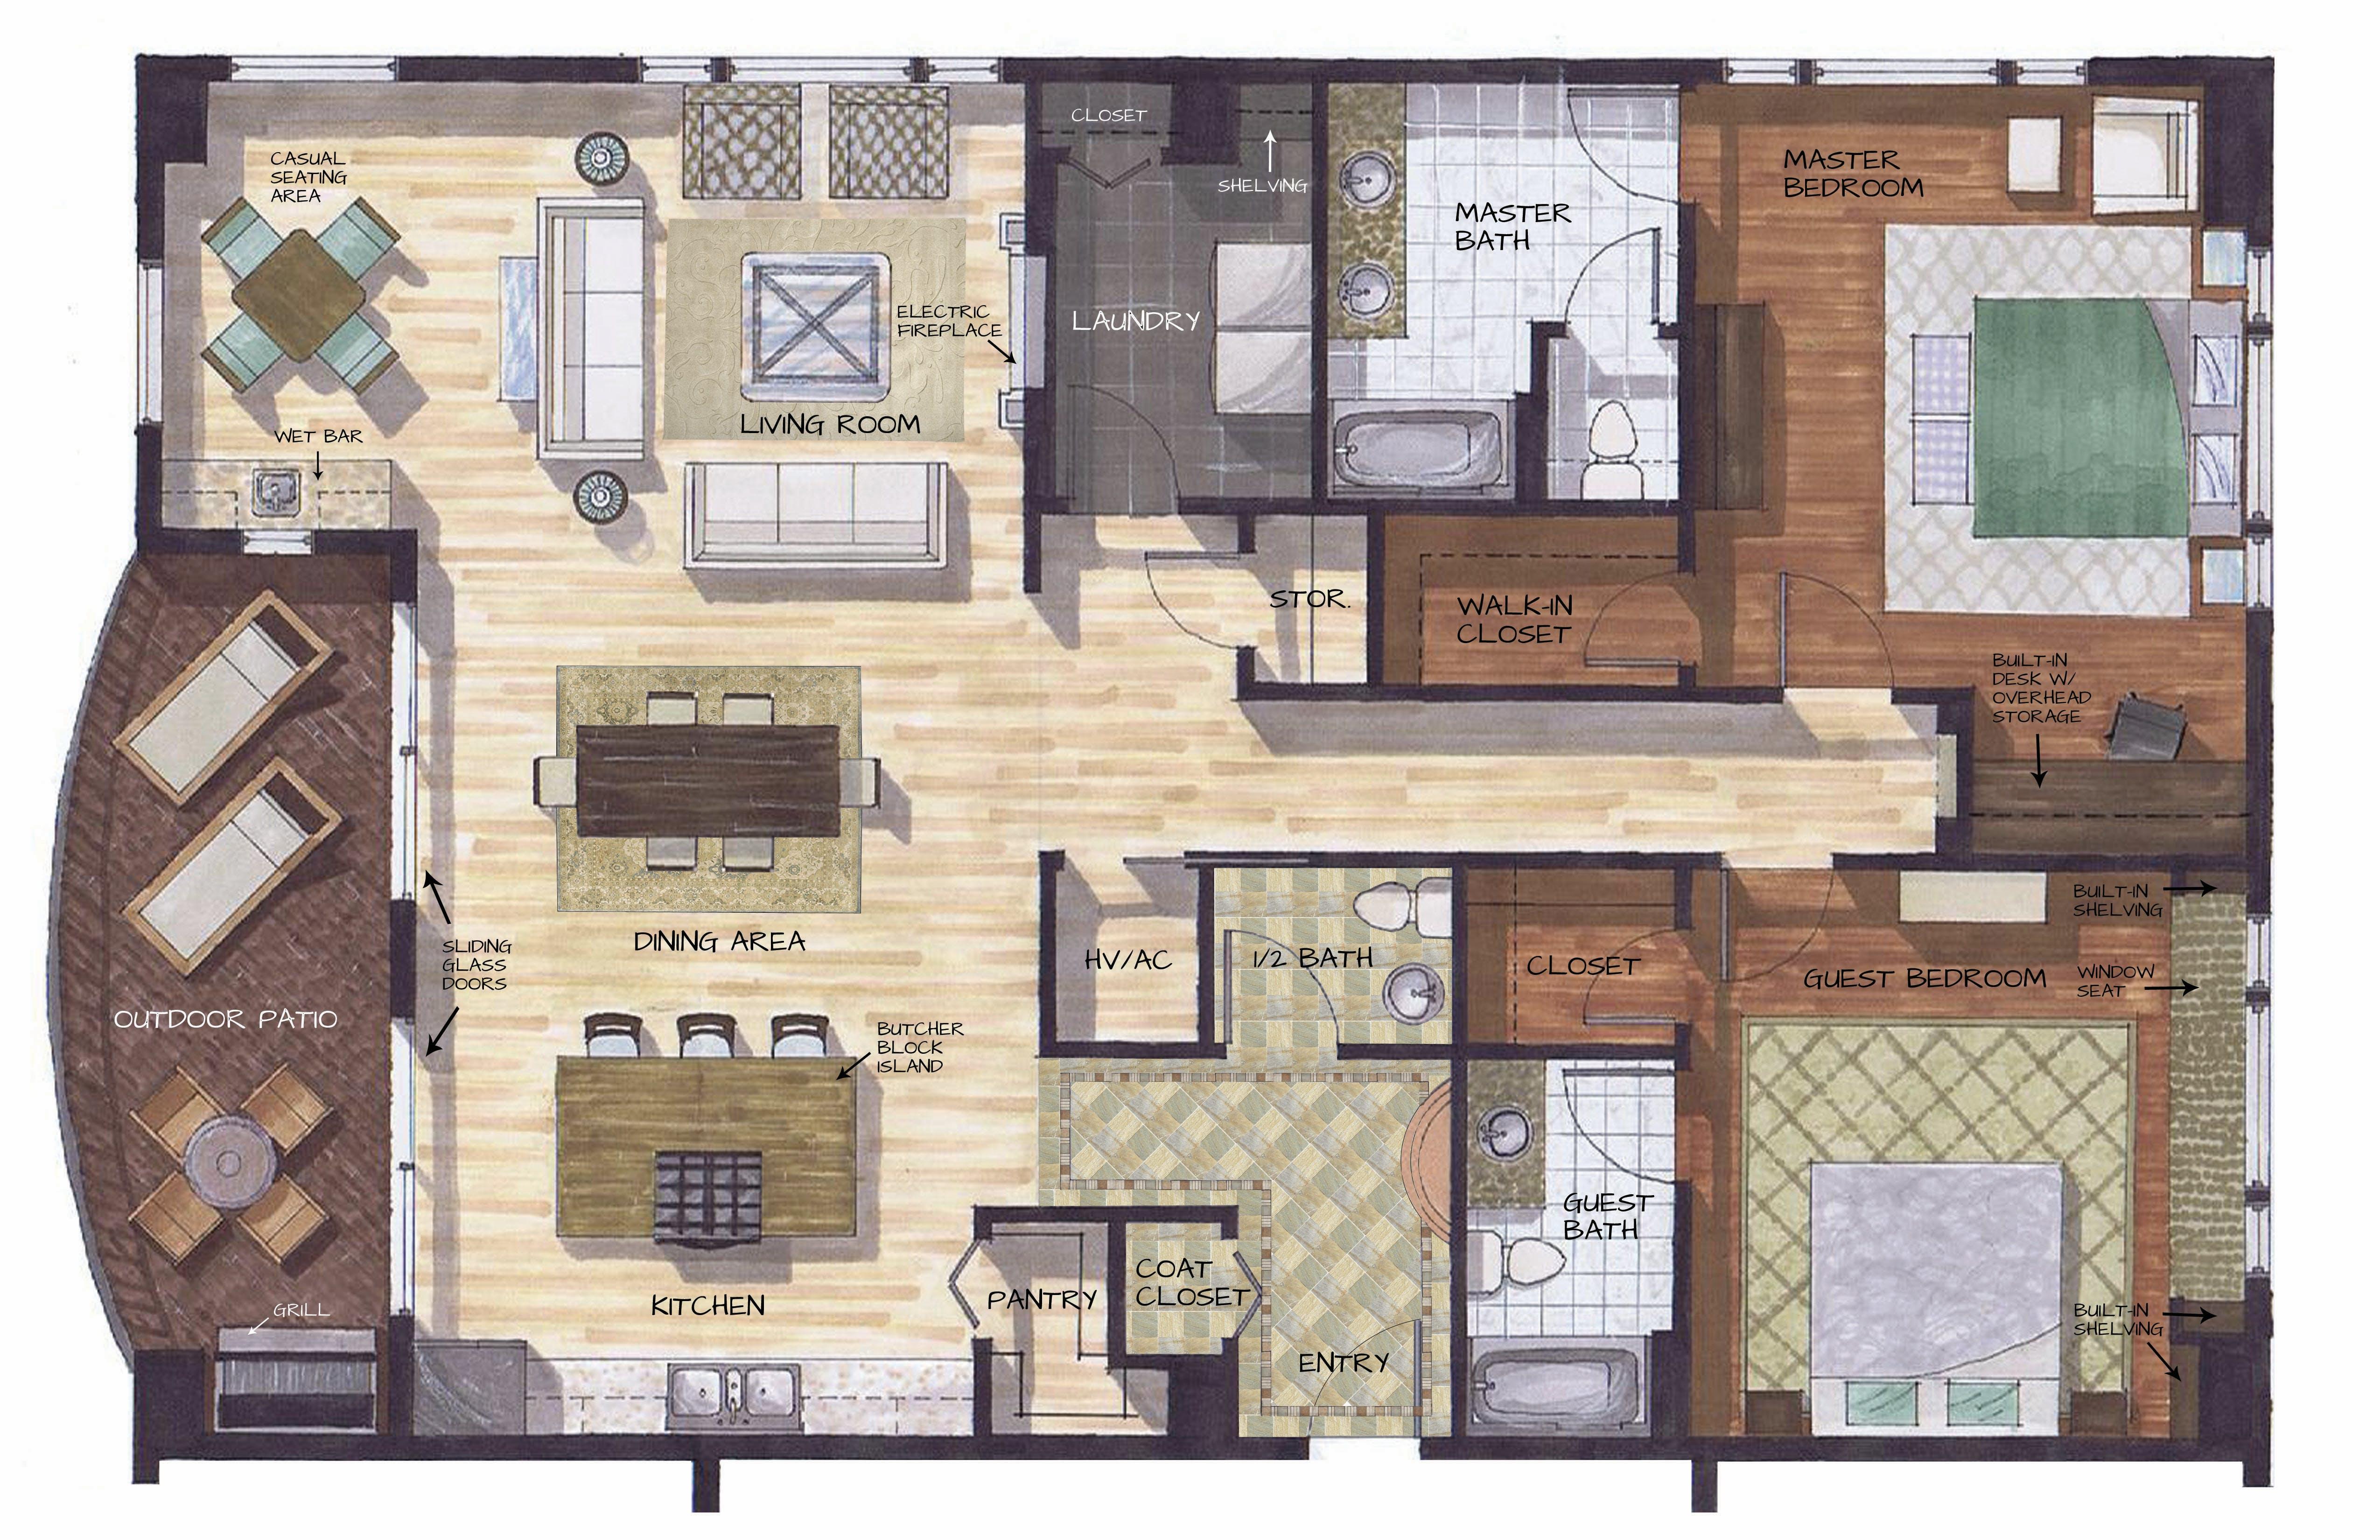 House Of Blues Floor Plan Penthouse Apartment Lori Touchton Archinect